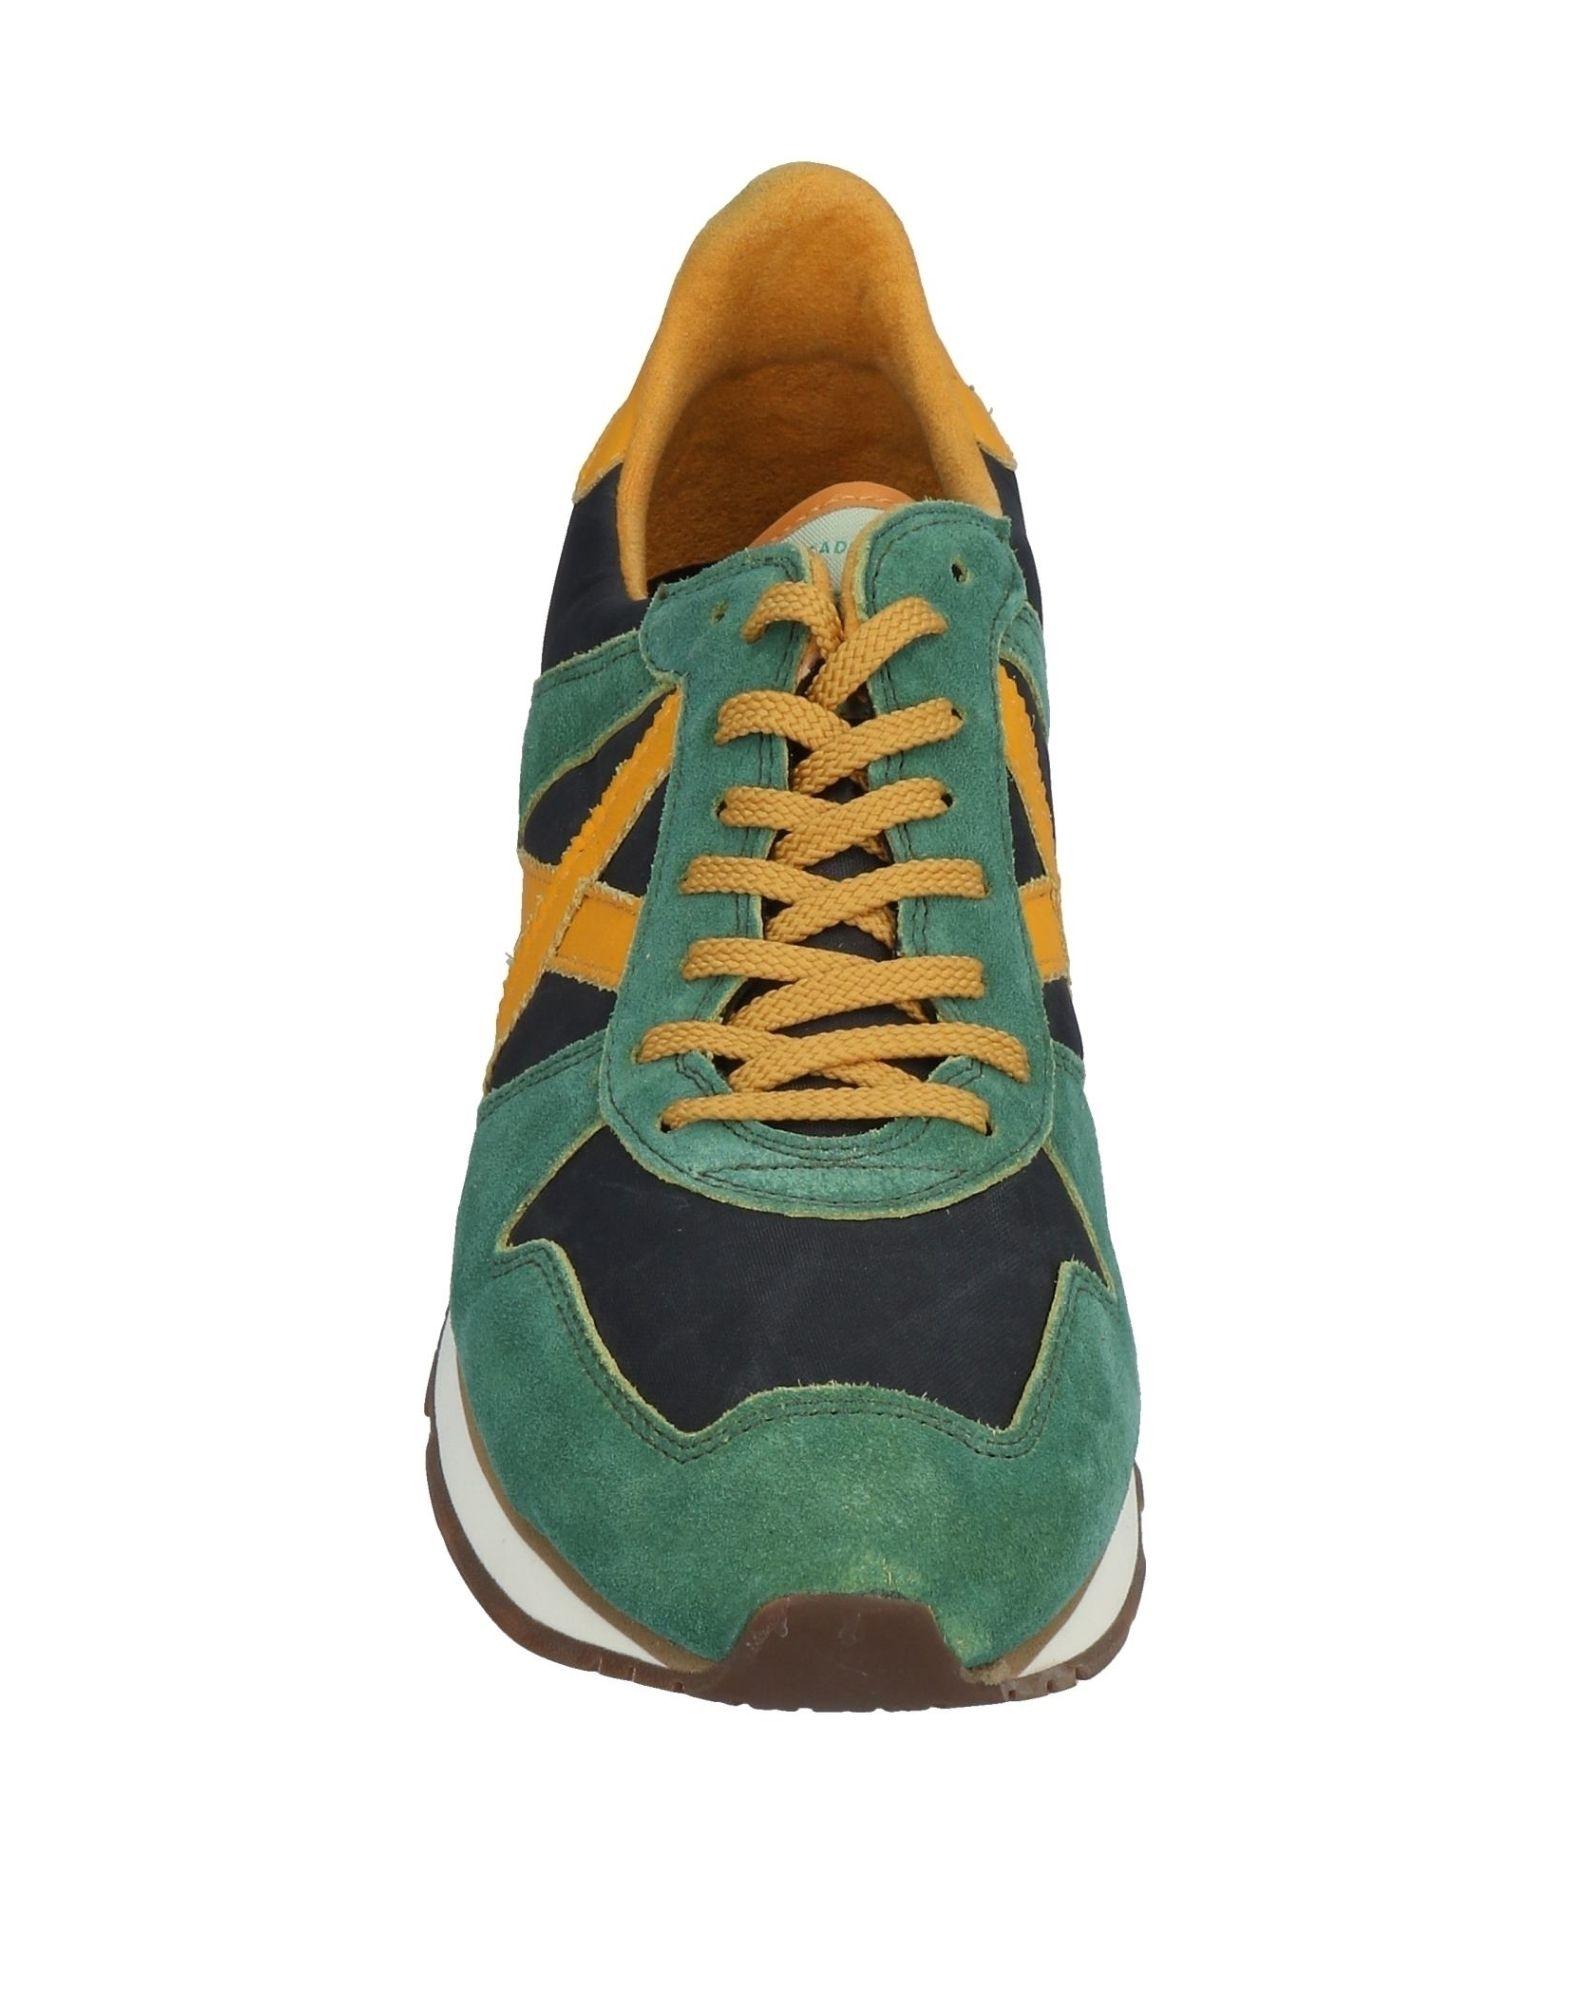 Rabatt echte  Schuhe Munich Sneakers Herren  echte 11490691AS 79c657